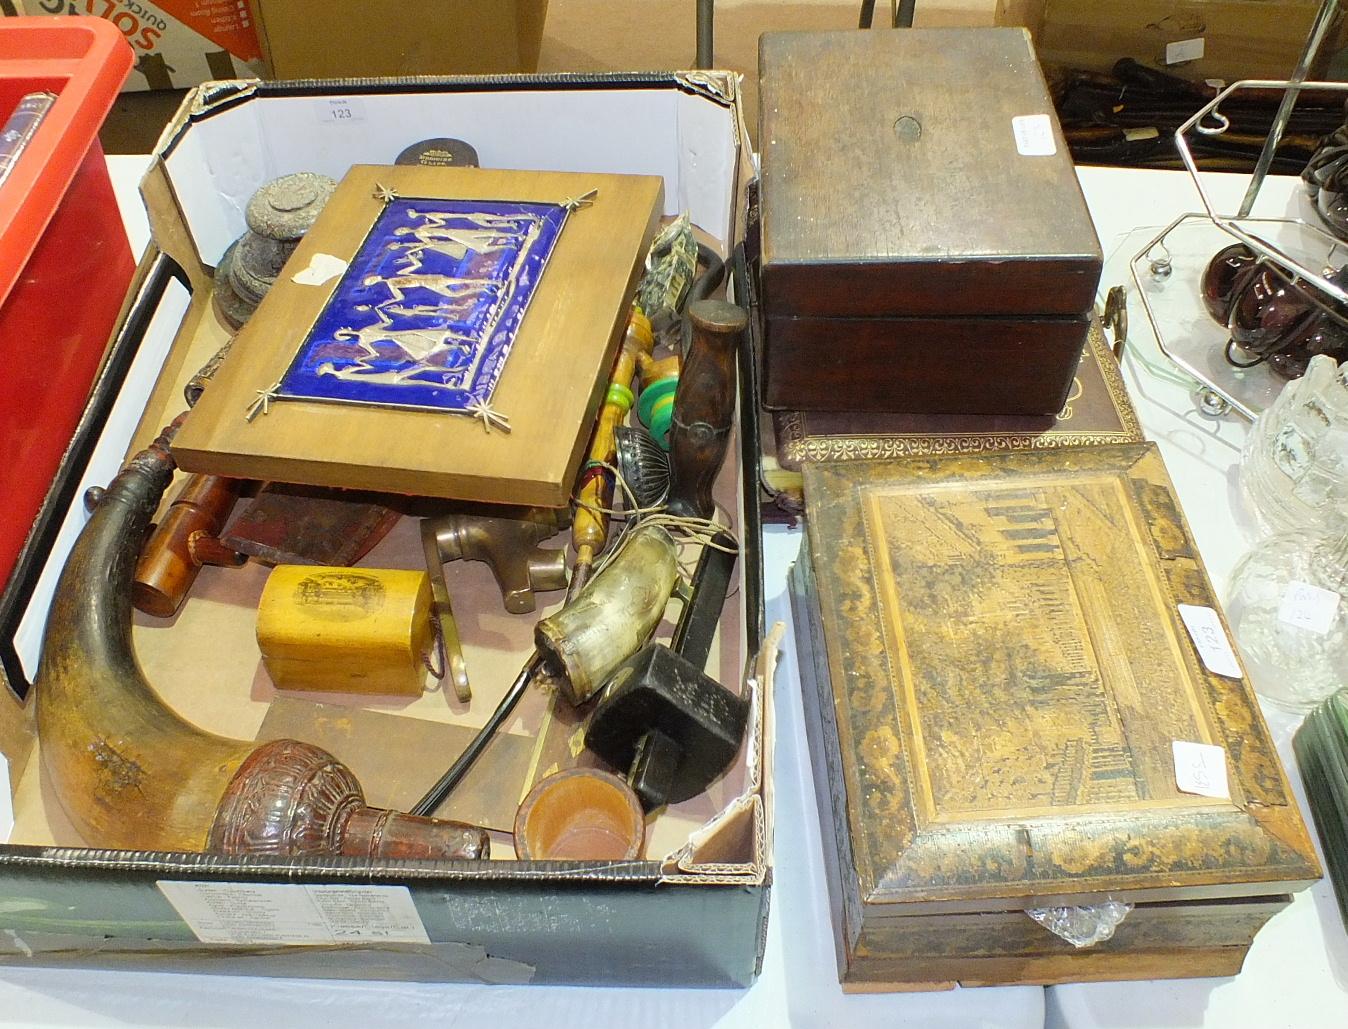 Lot 123 - A damaged Tunbridgeware work box, 24cm wide, a stevedore's hook, horn powder flask and other